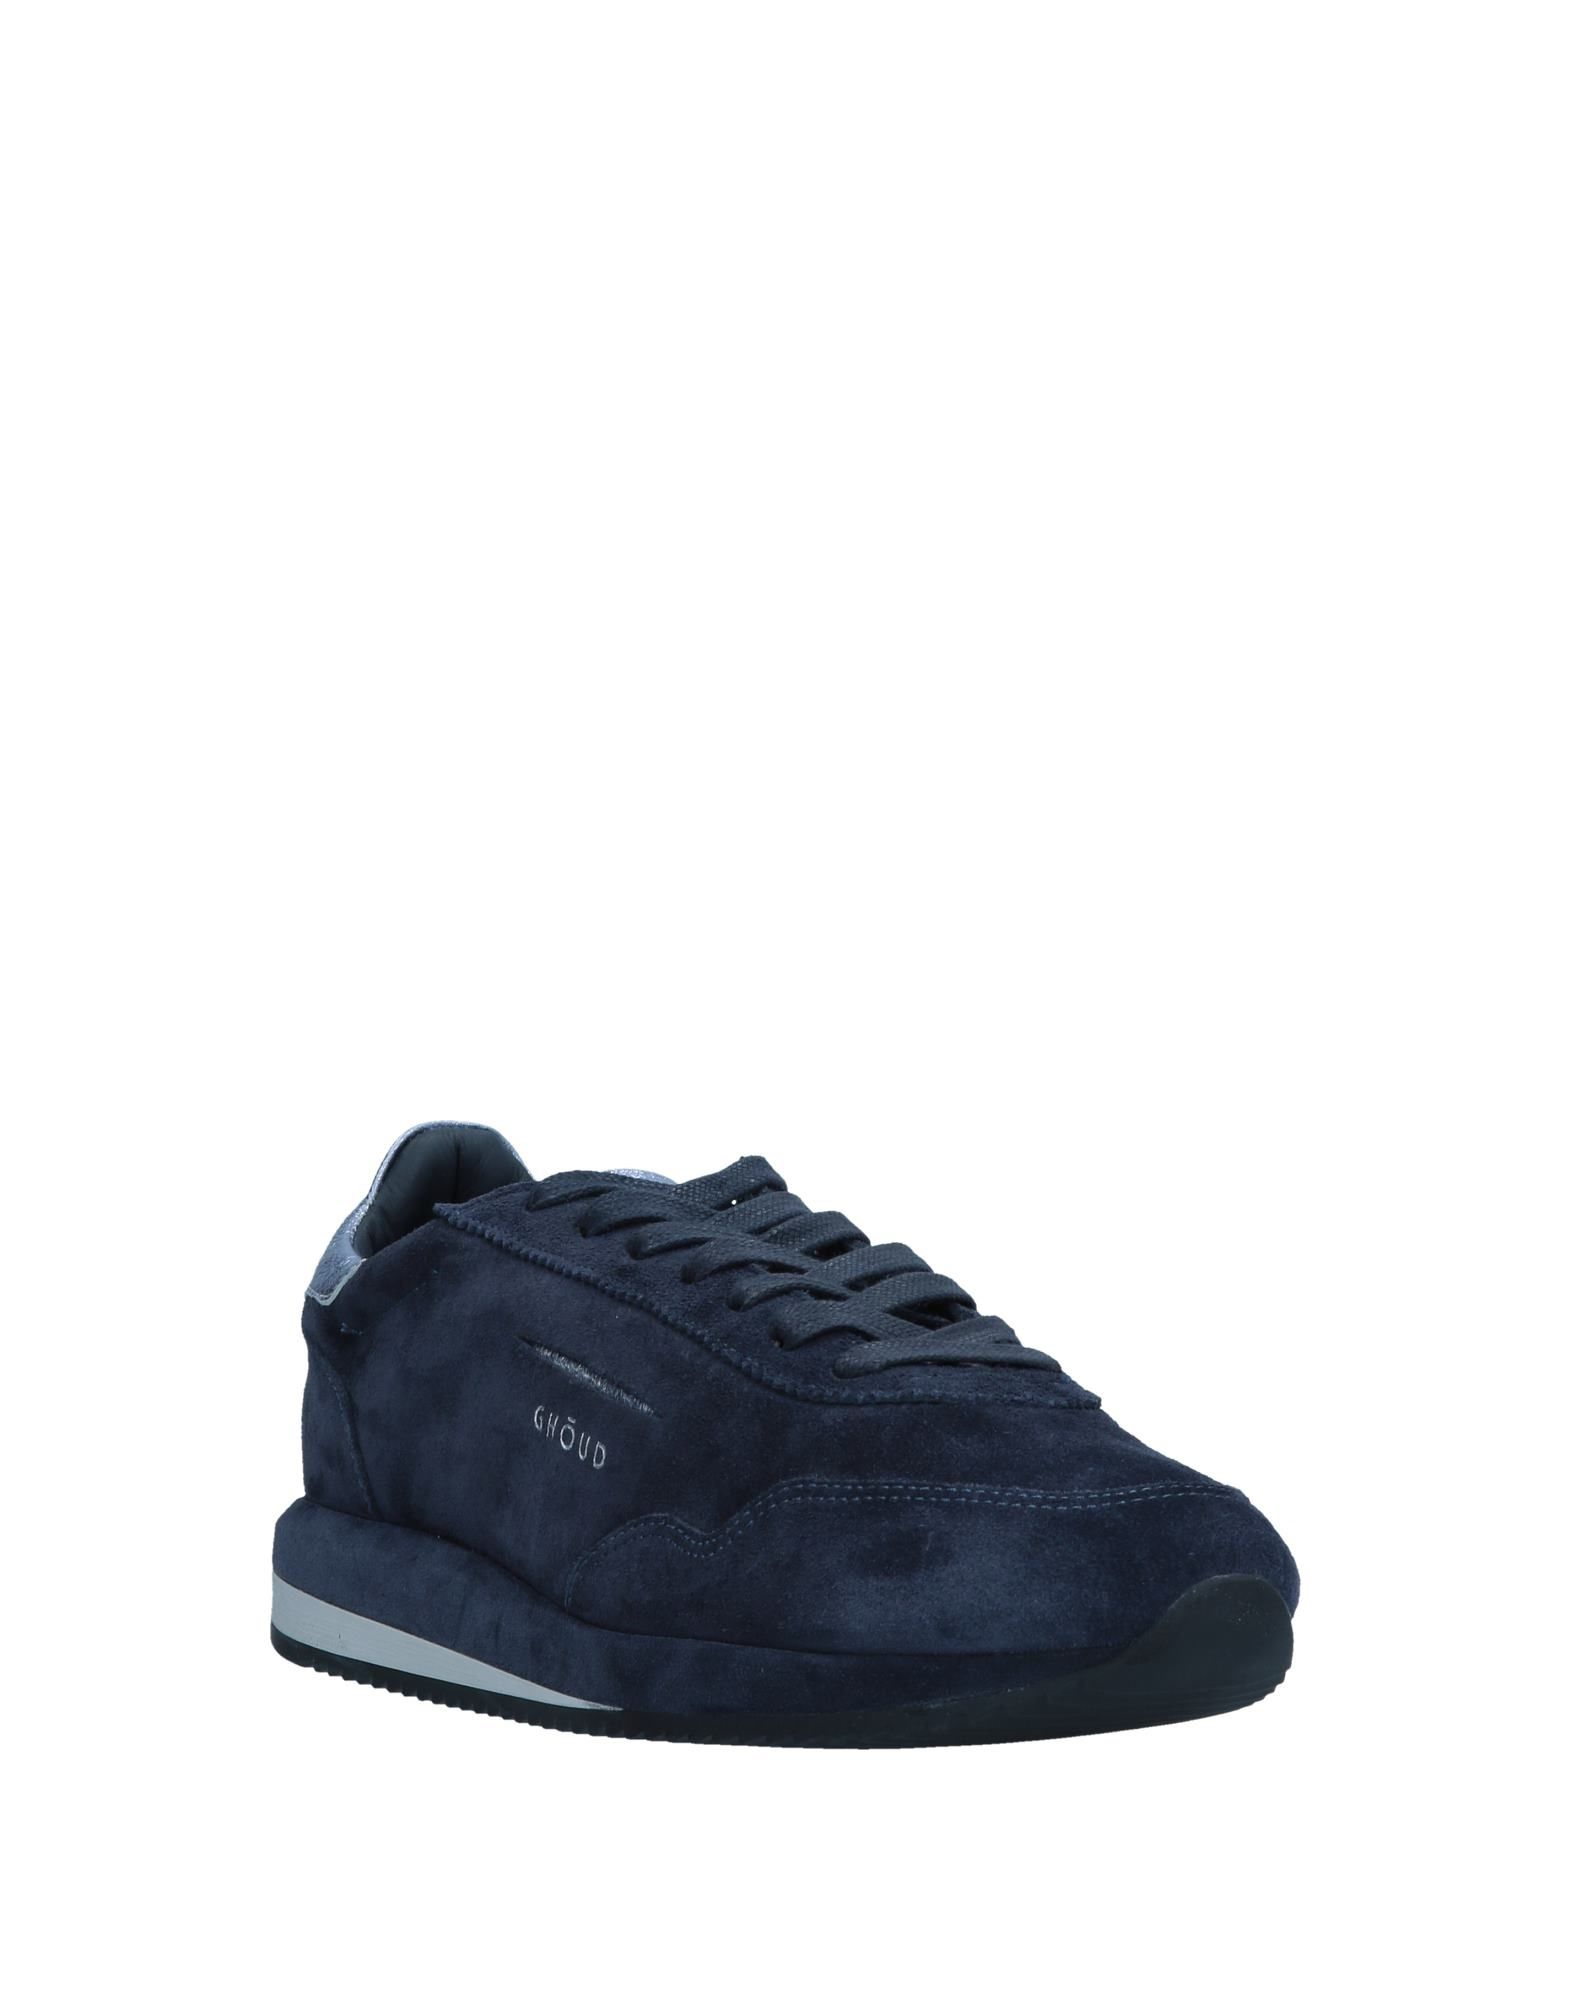 Ghōud Venice Sneakers Herren  Schuhe 11545397SL Gute Qualität beliebte Schuhe  80e99c